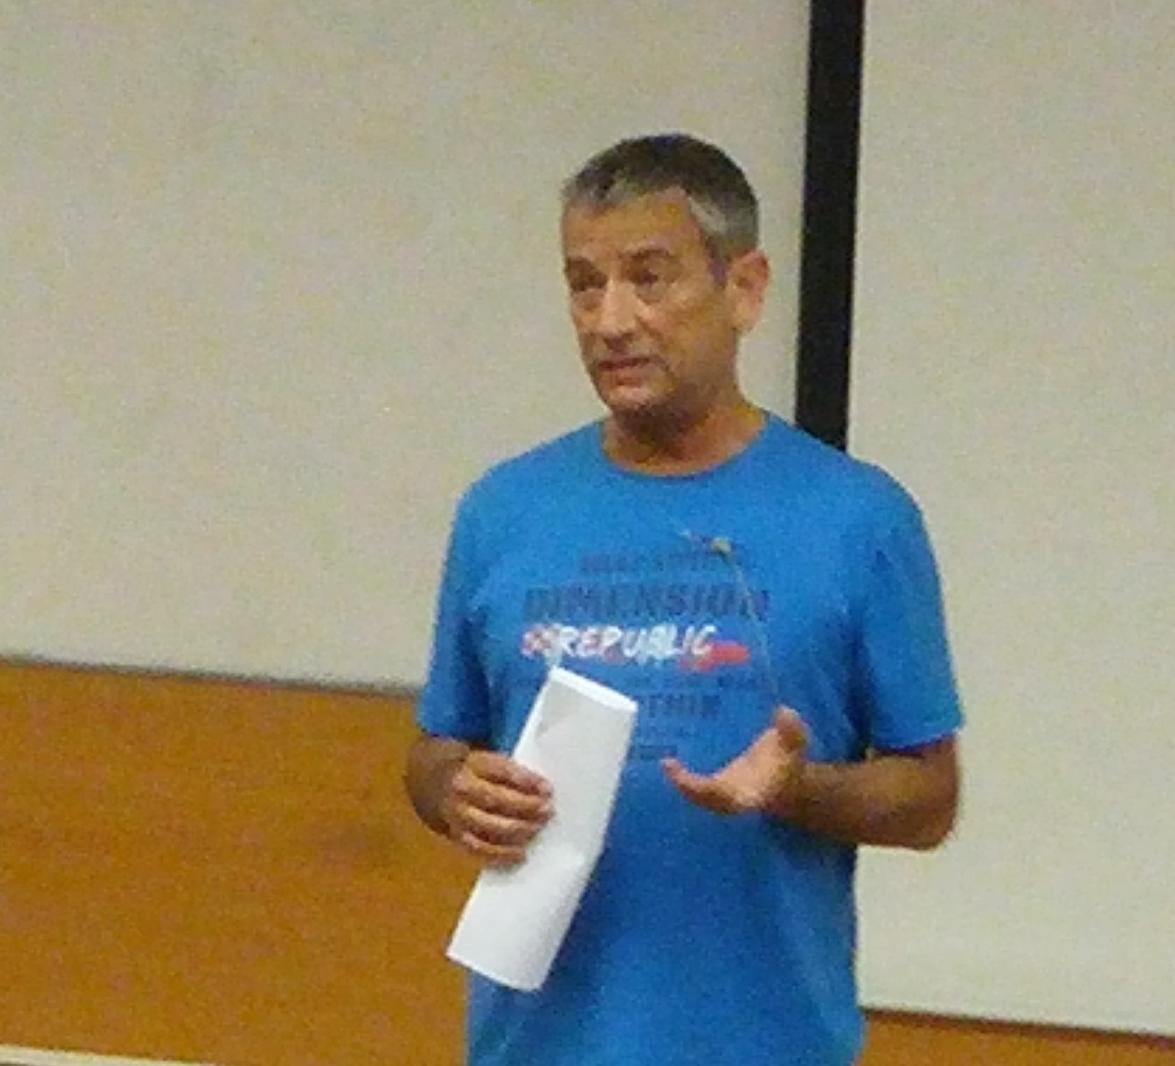 Image of Adi Barkan from Wikidata